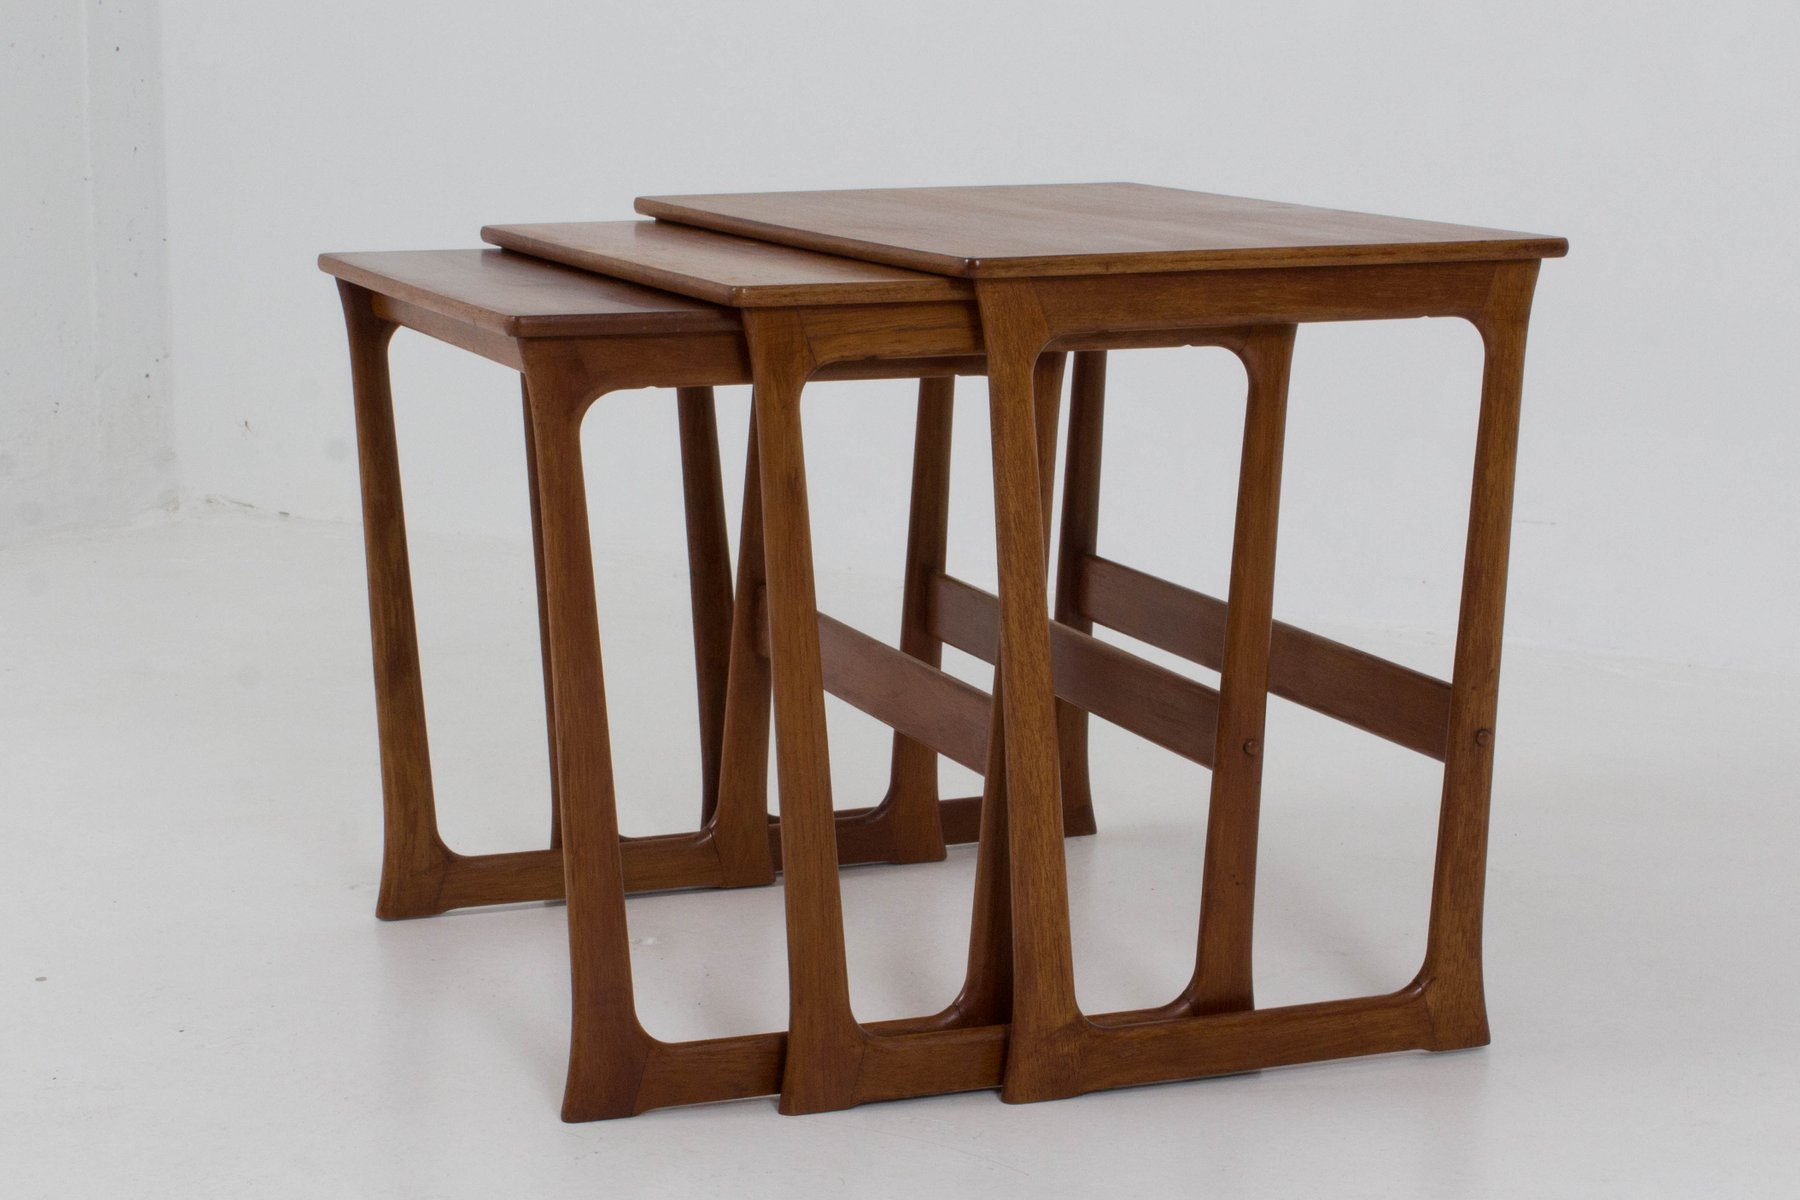 midcentury danish modern nesting tables by johannes andersen  - price per set